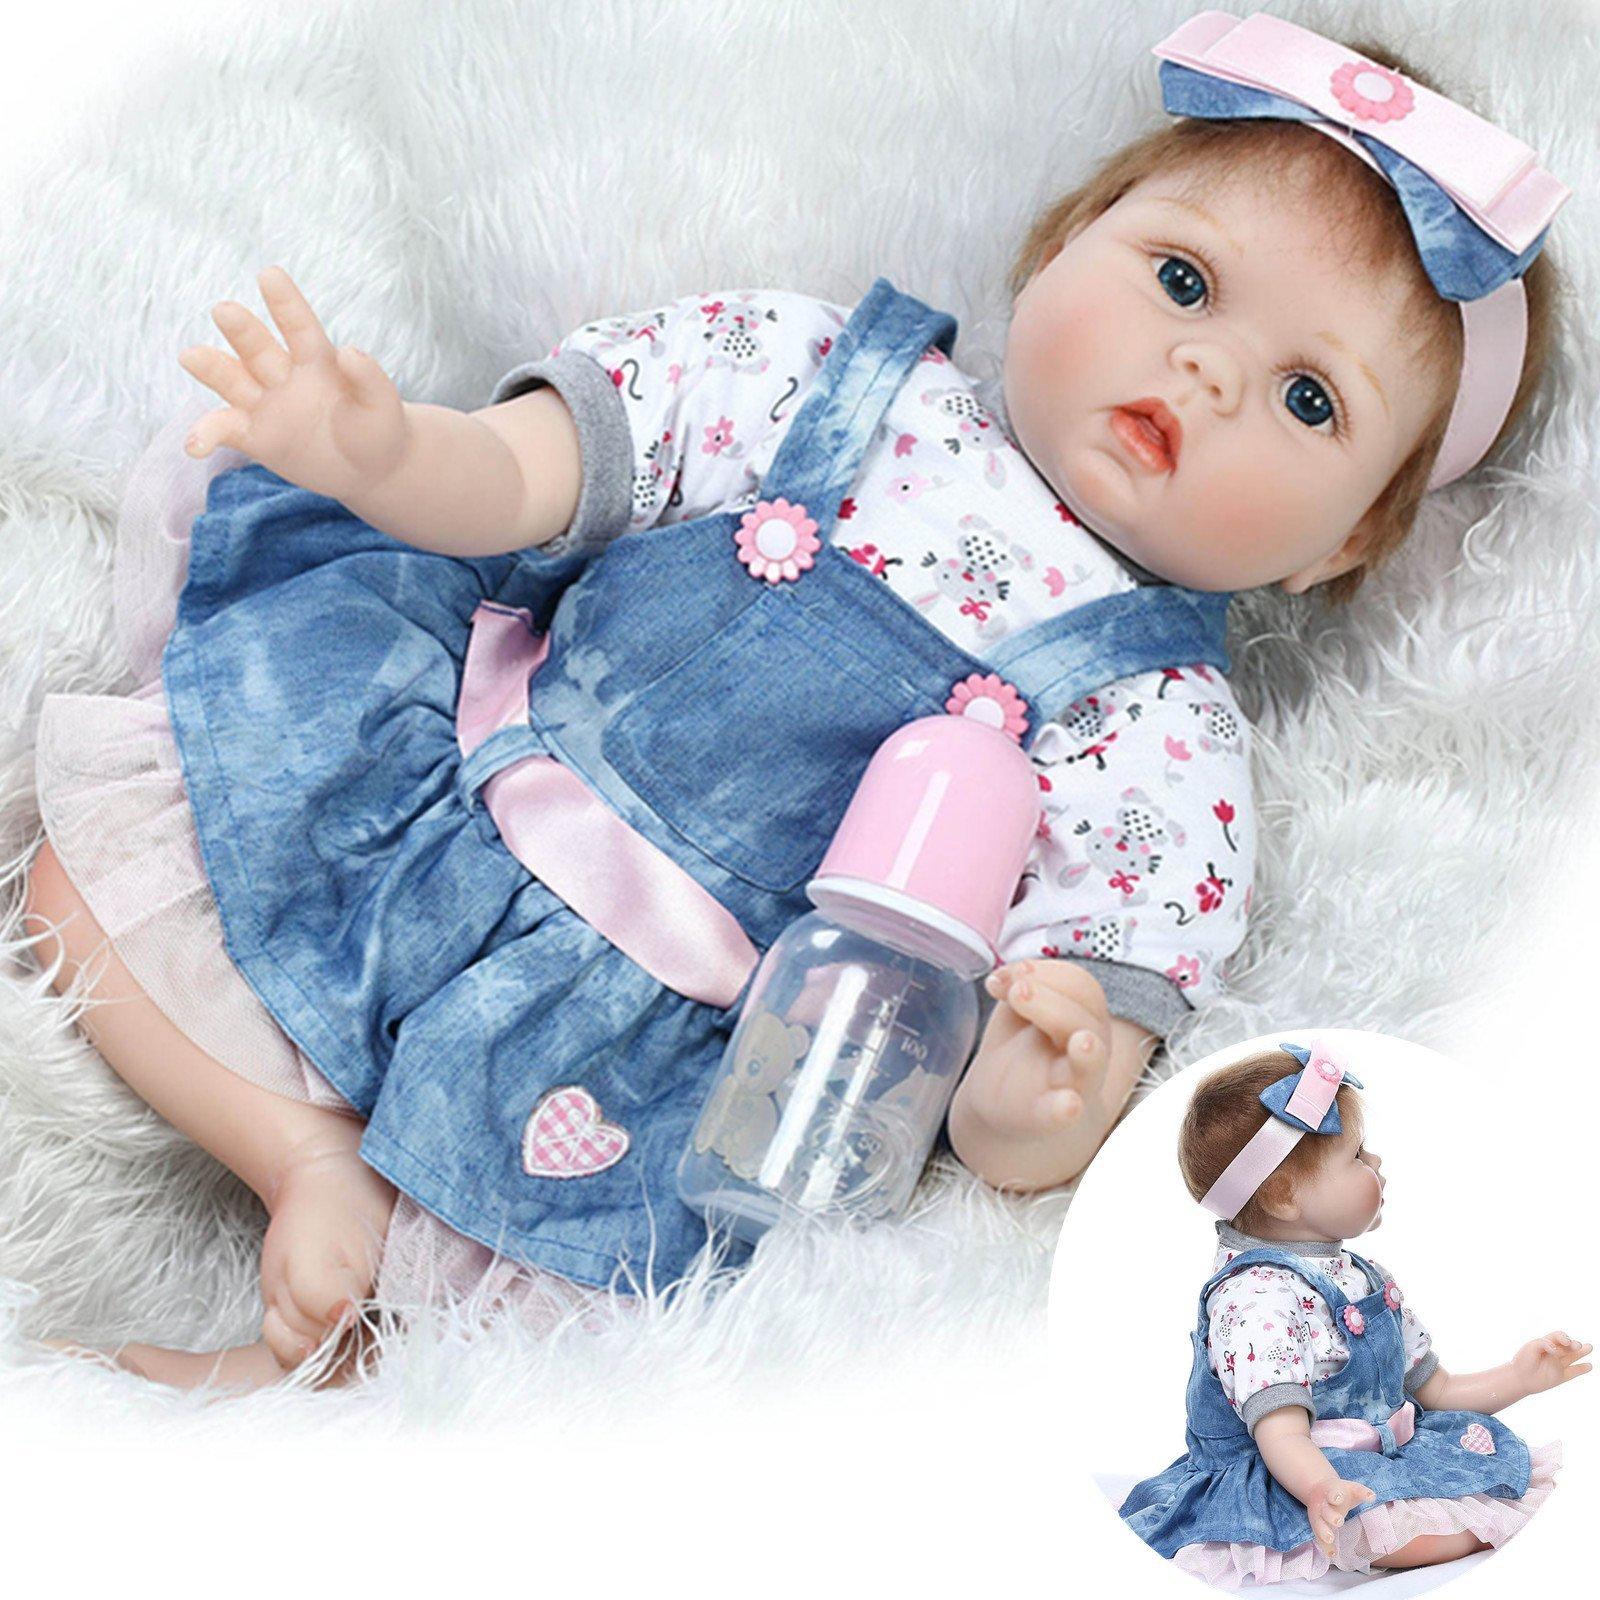 Reborn Baby Doll Girl 22inch 55cm Realistic Soft Vinyl Silicone Doll Real Baby Doll Denim Dress Baby Toys